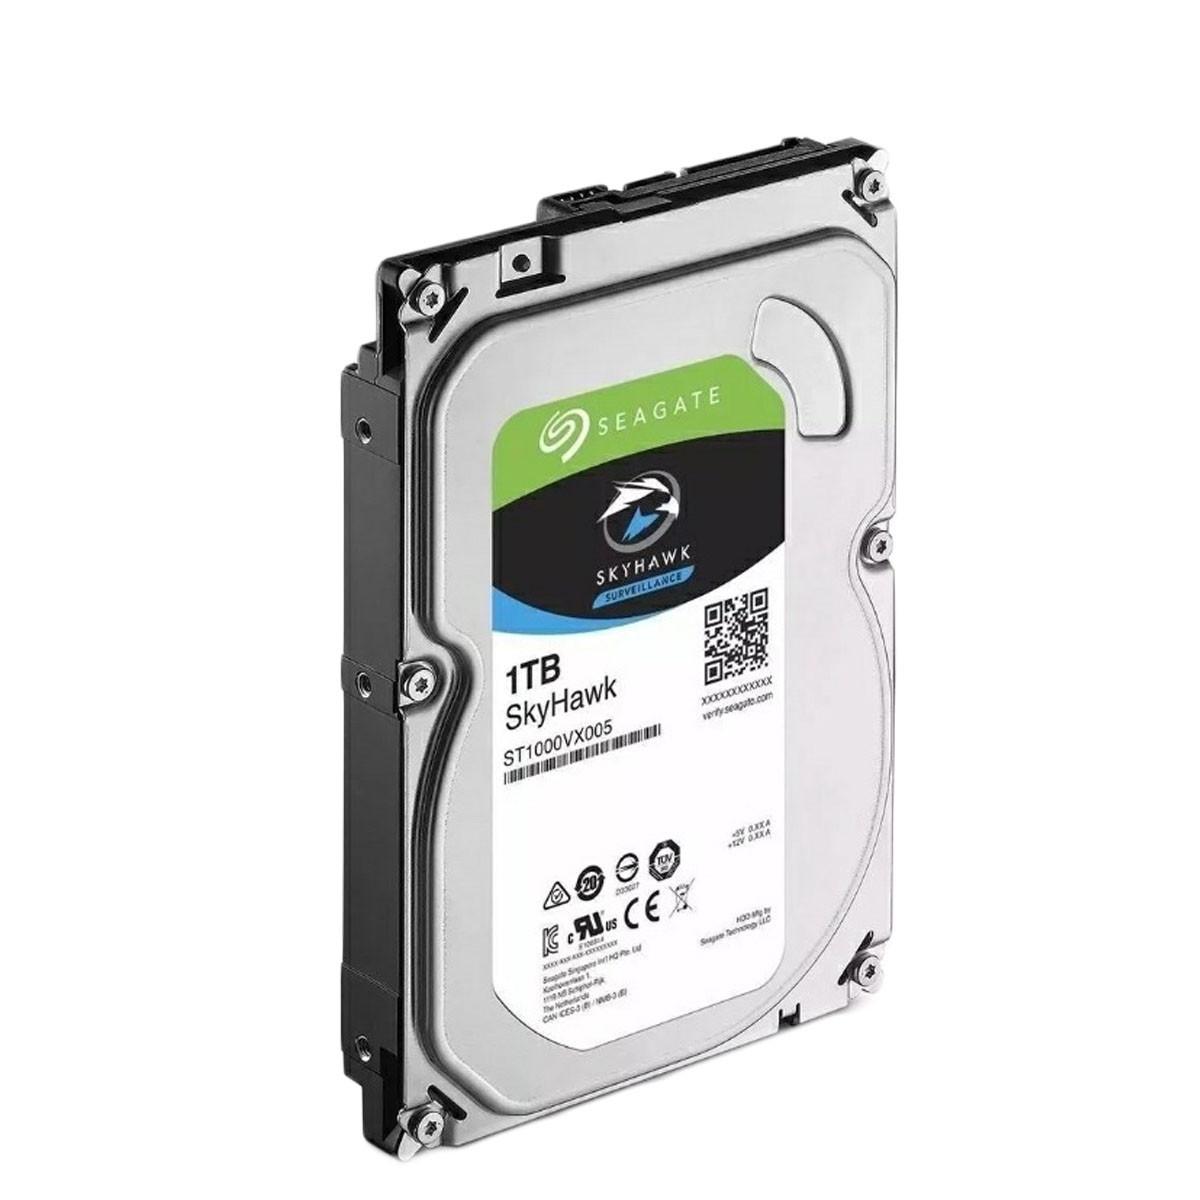 "HD Interno SkyHawk 1TB Seagate ST1000VX005 3,5"" (polegadas) 5.900RPM 64MB Cache SATA 3 300MB/s"